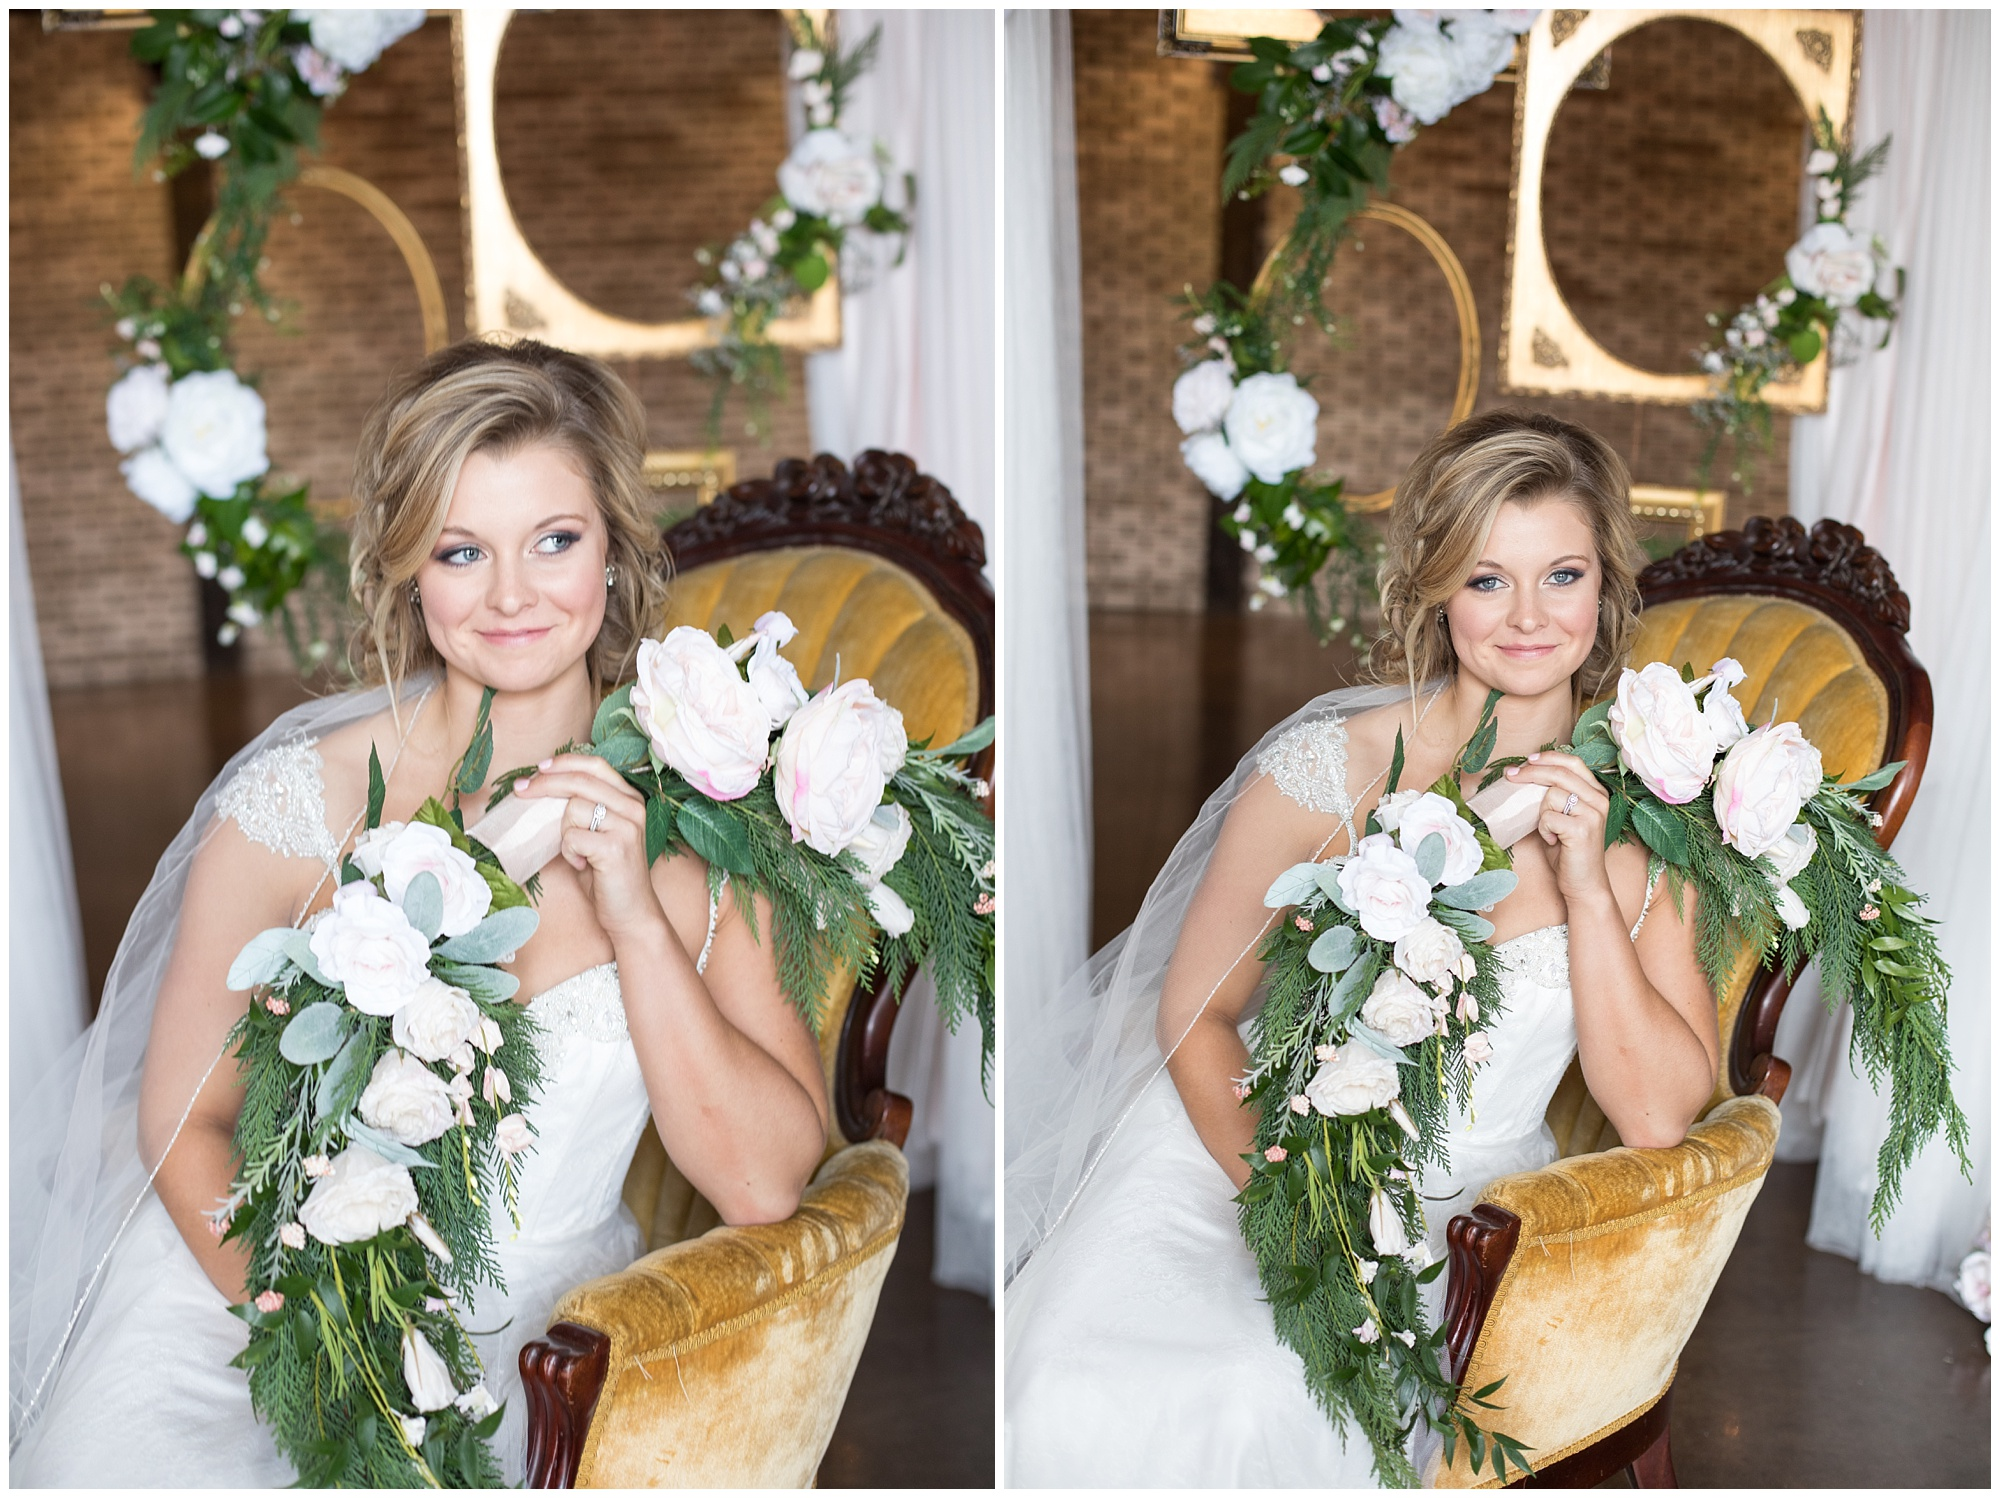 bride with wreath bouquet